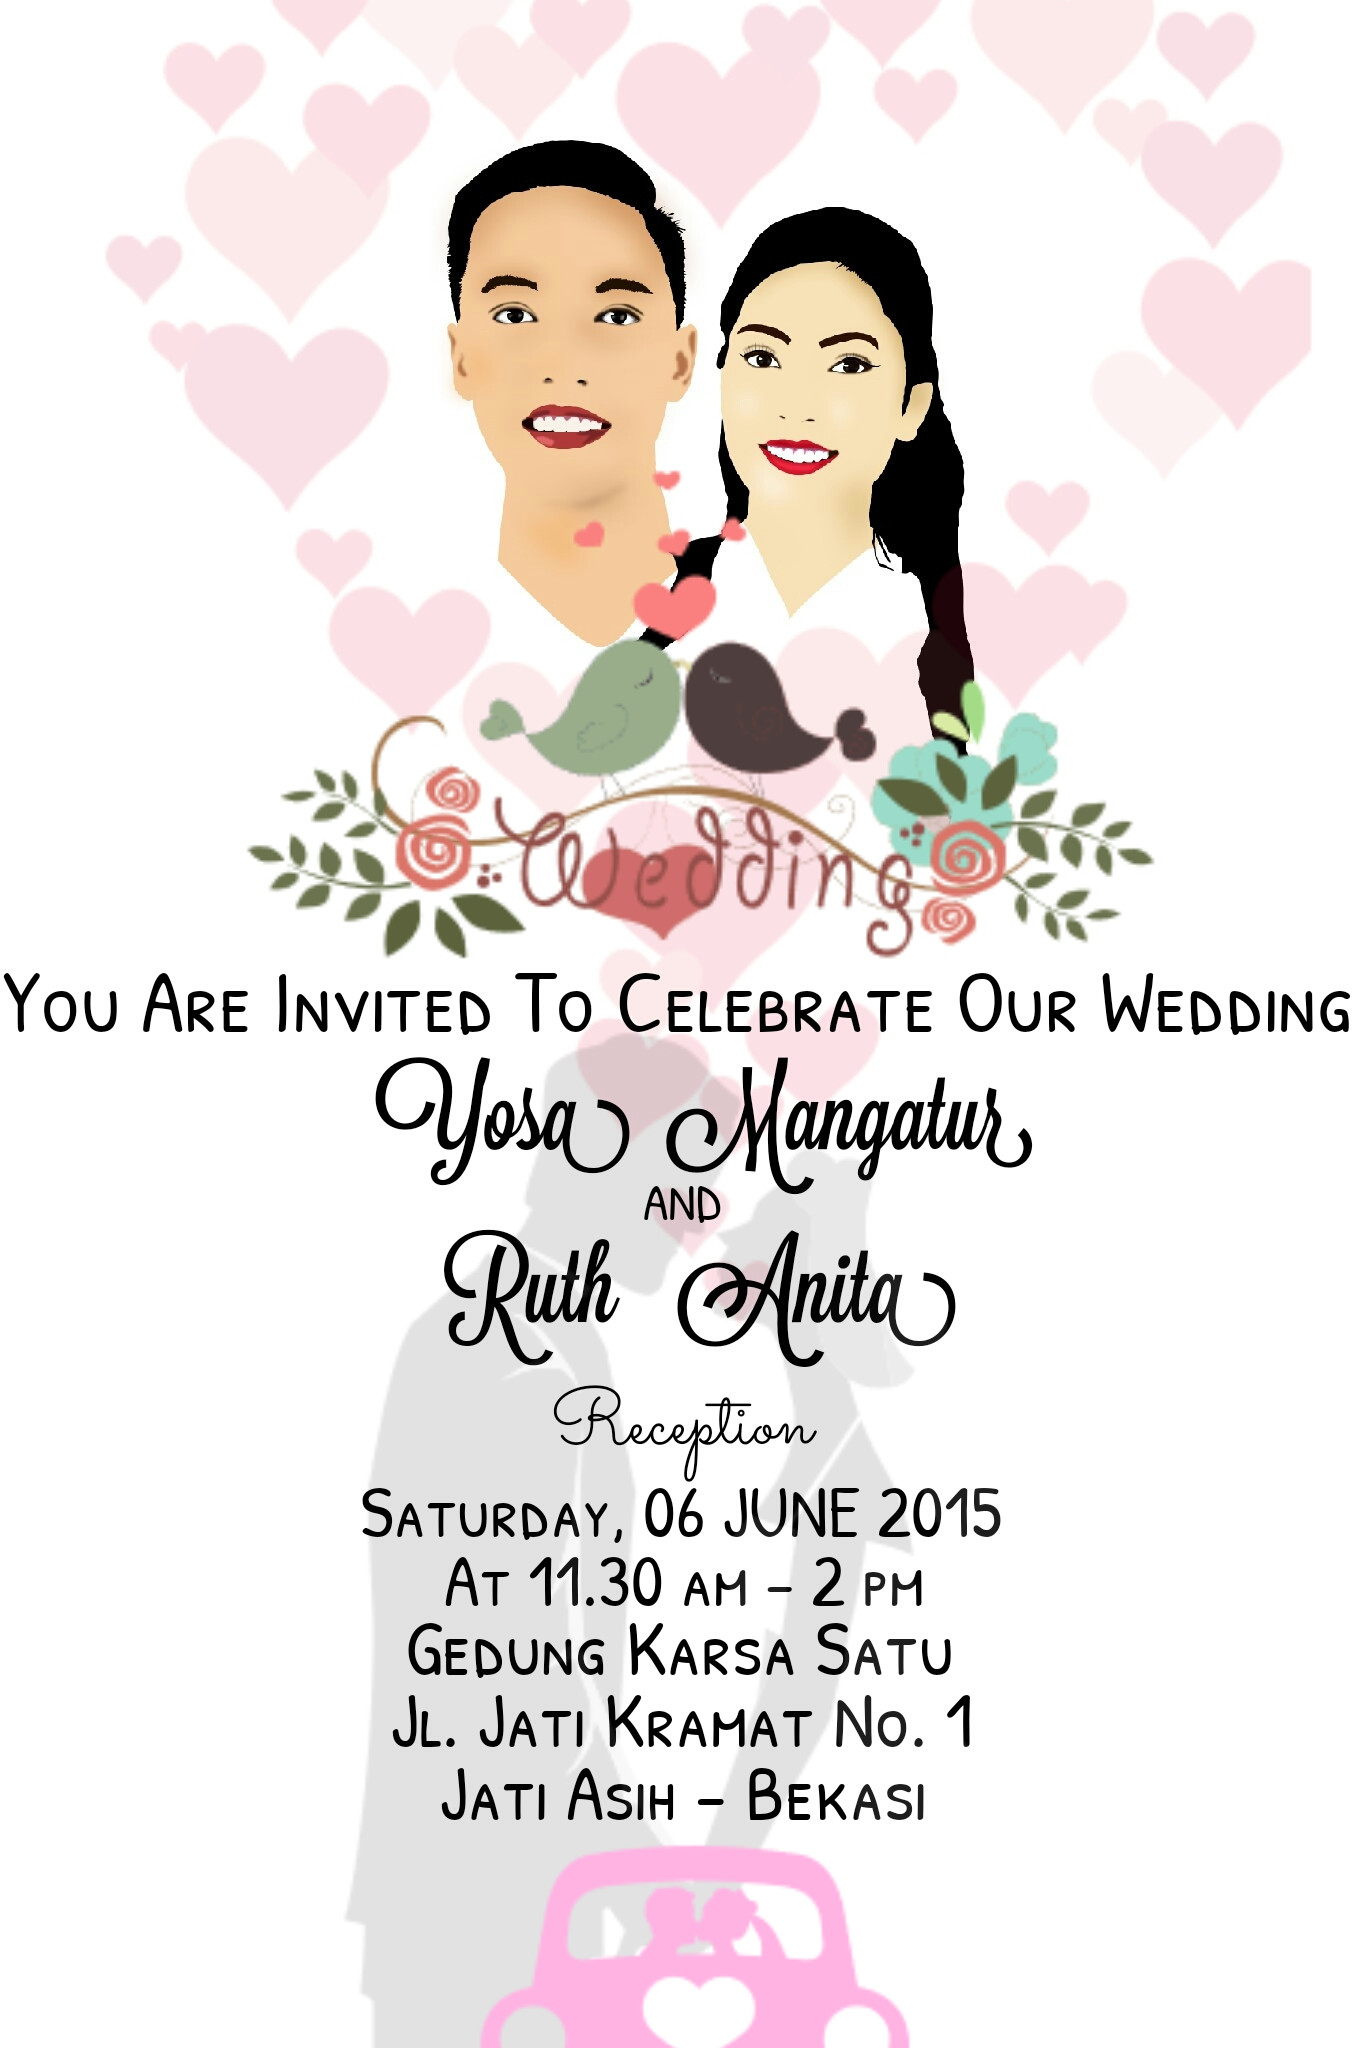 ArtStation - Wedding e-invitation, Winda Purba